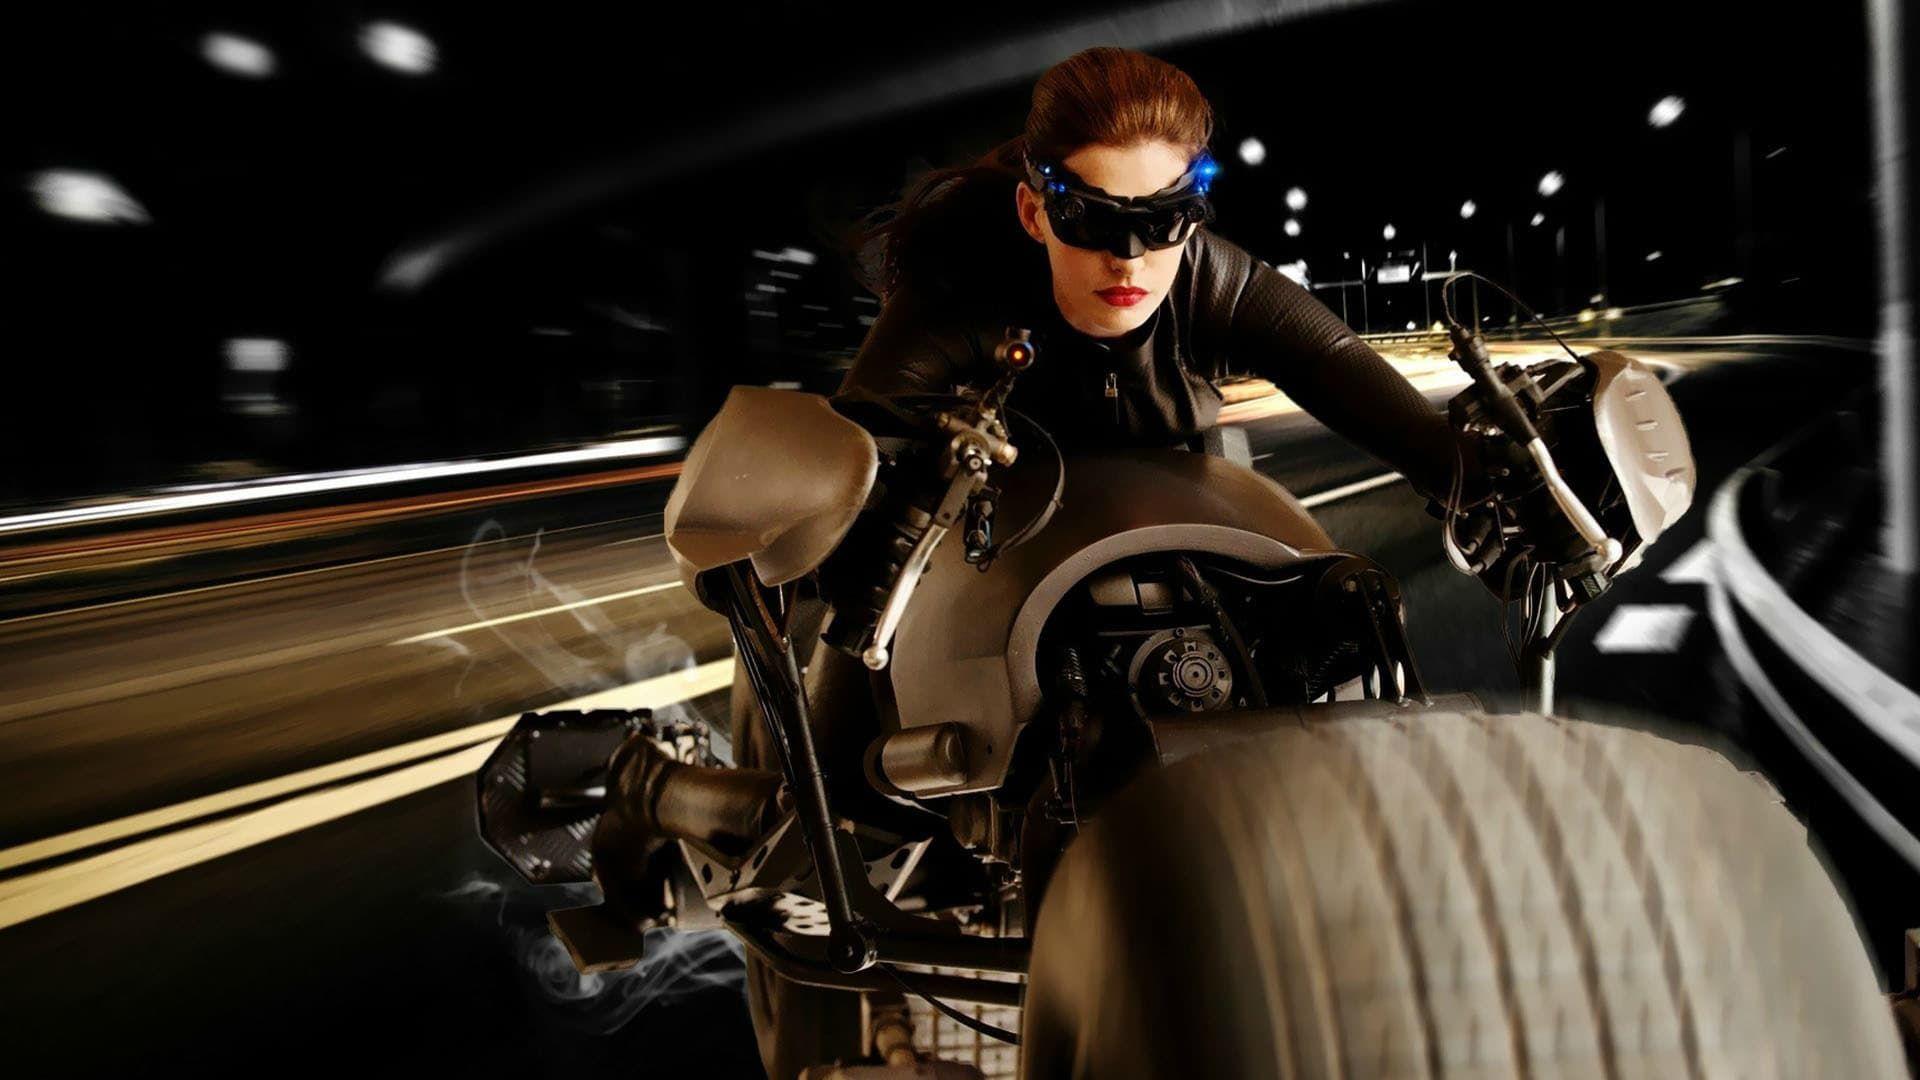 The Dark Knight Rises 2012 Ganzer Film Stream Deutsch Komplett Online The Dark Knight Rises 2 The Dark Knight Rises Dark Knight Dark Knight Rises Catwoman